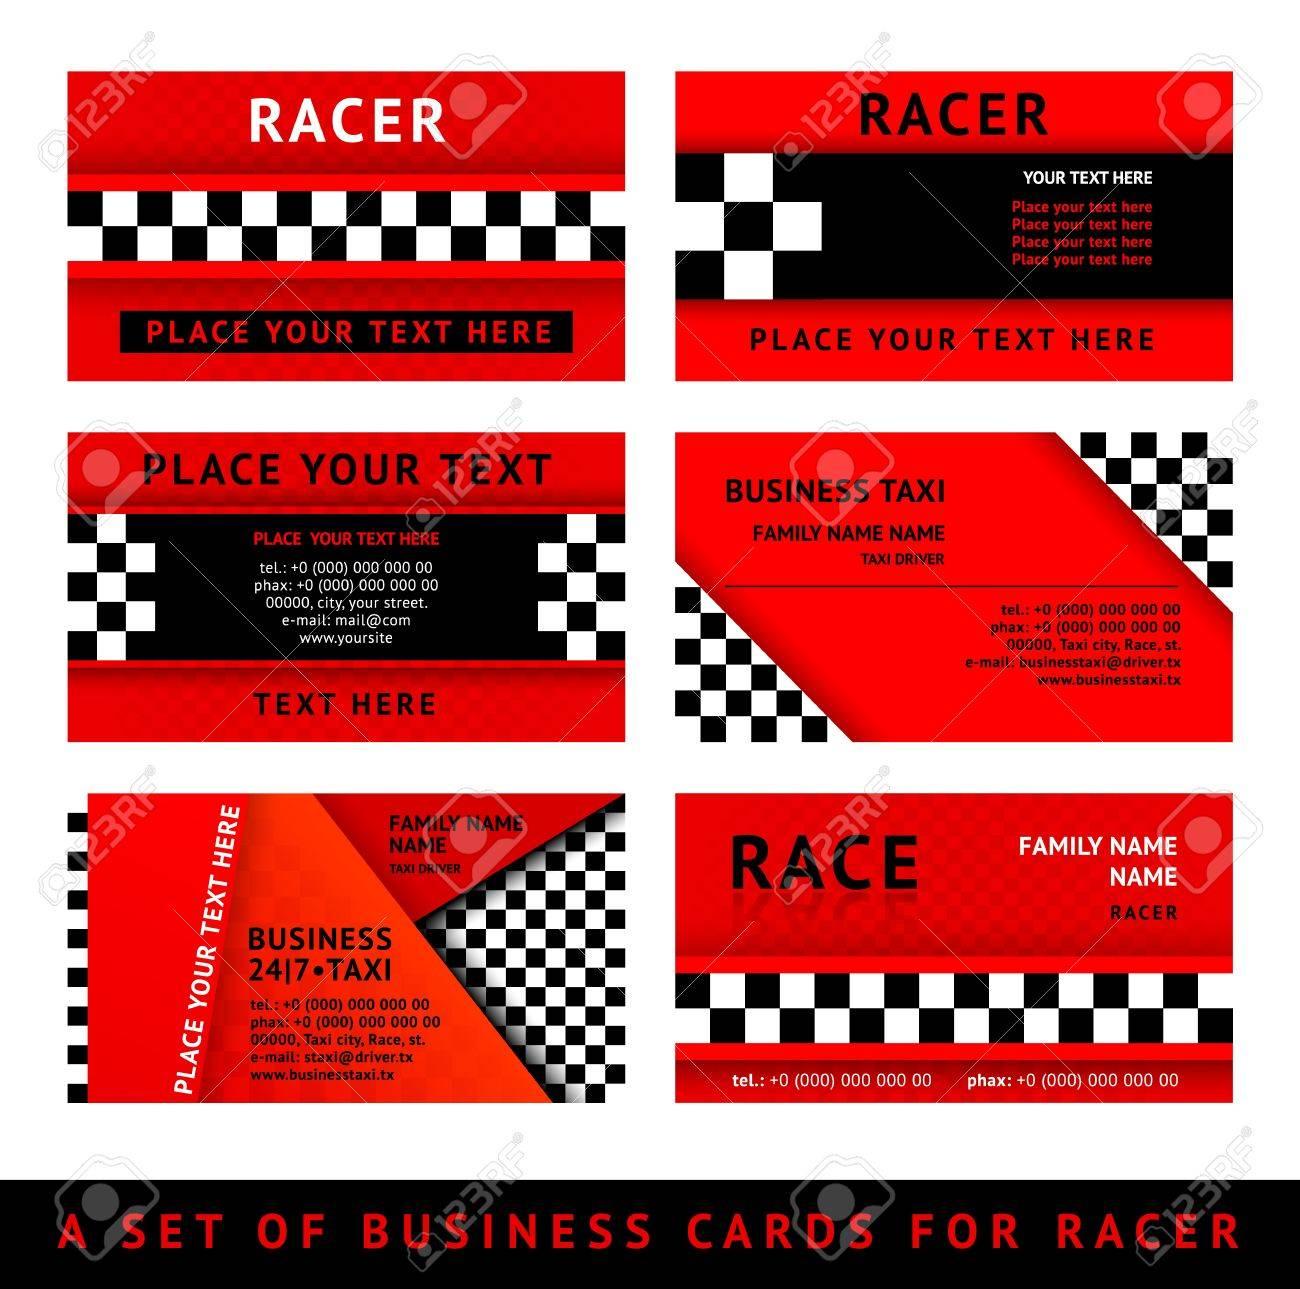 Business card driver race third set royalty free cliparts vetores banco de imagens business card driver race third set reheart Choice Image